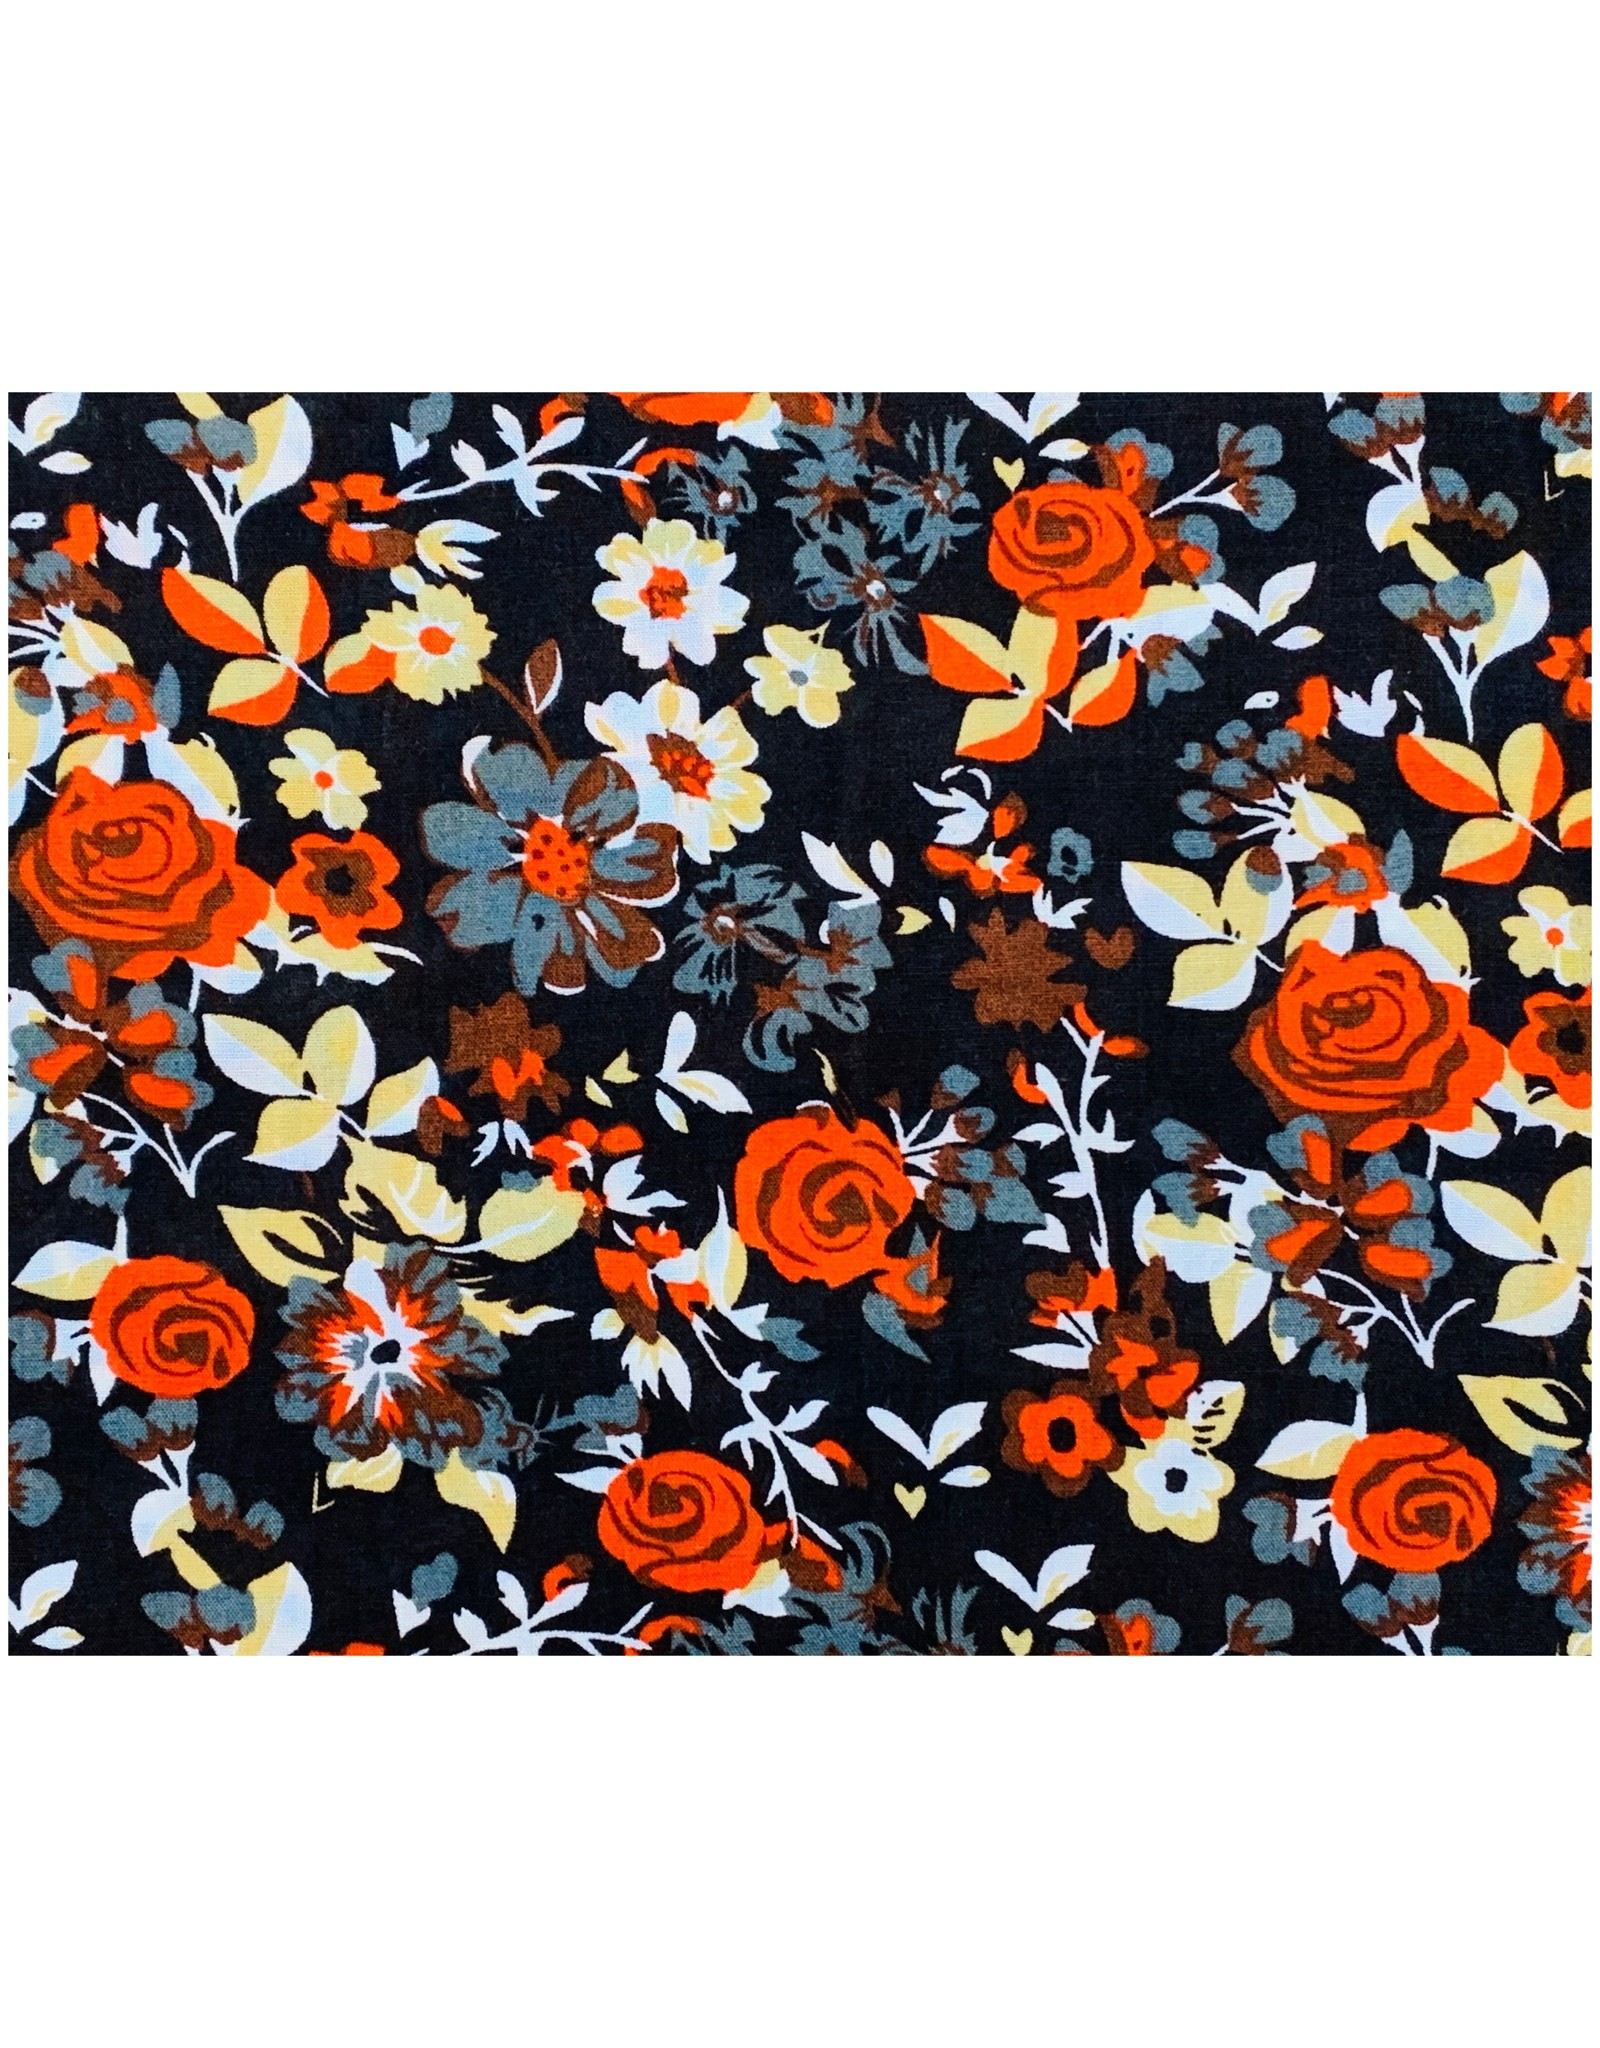 Viskose twill Print - Flowers